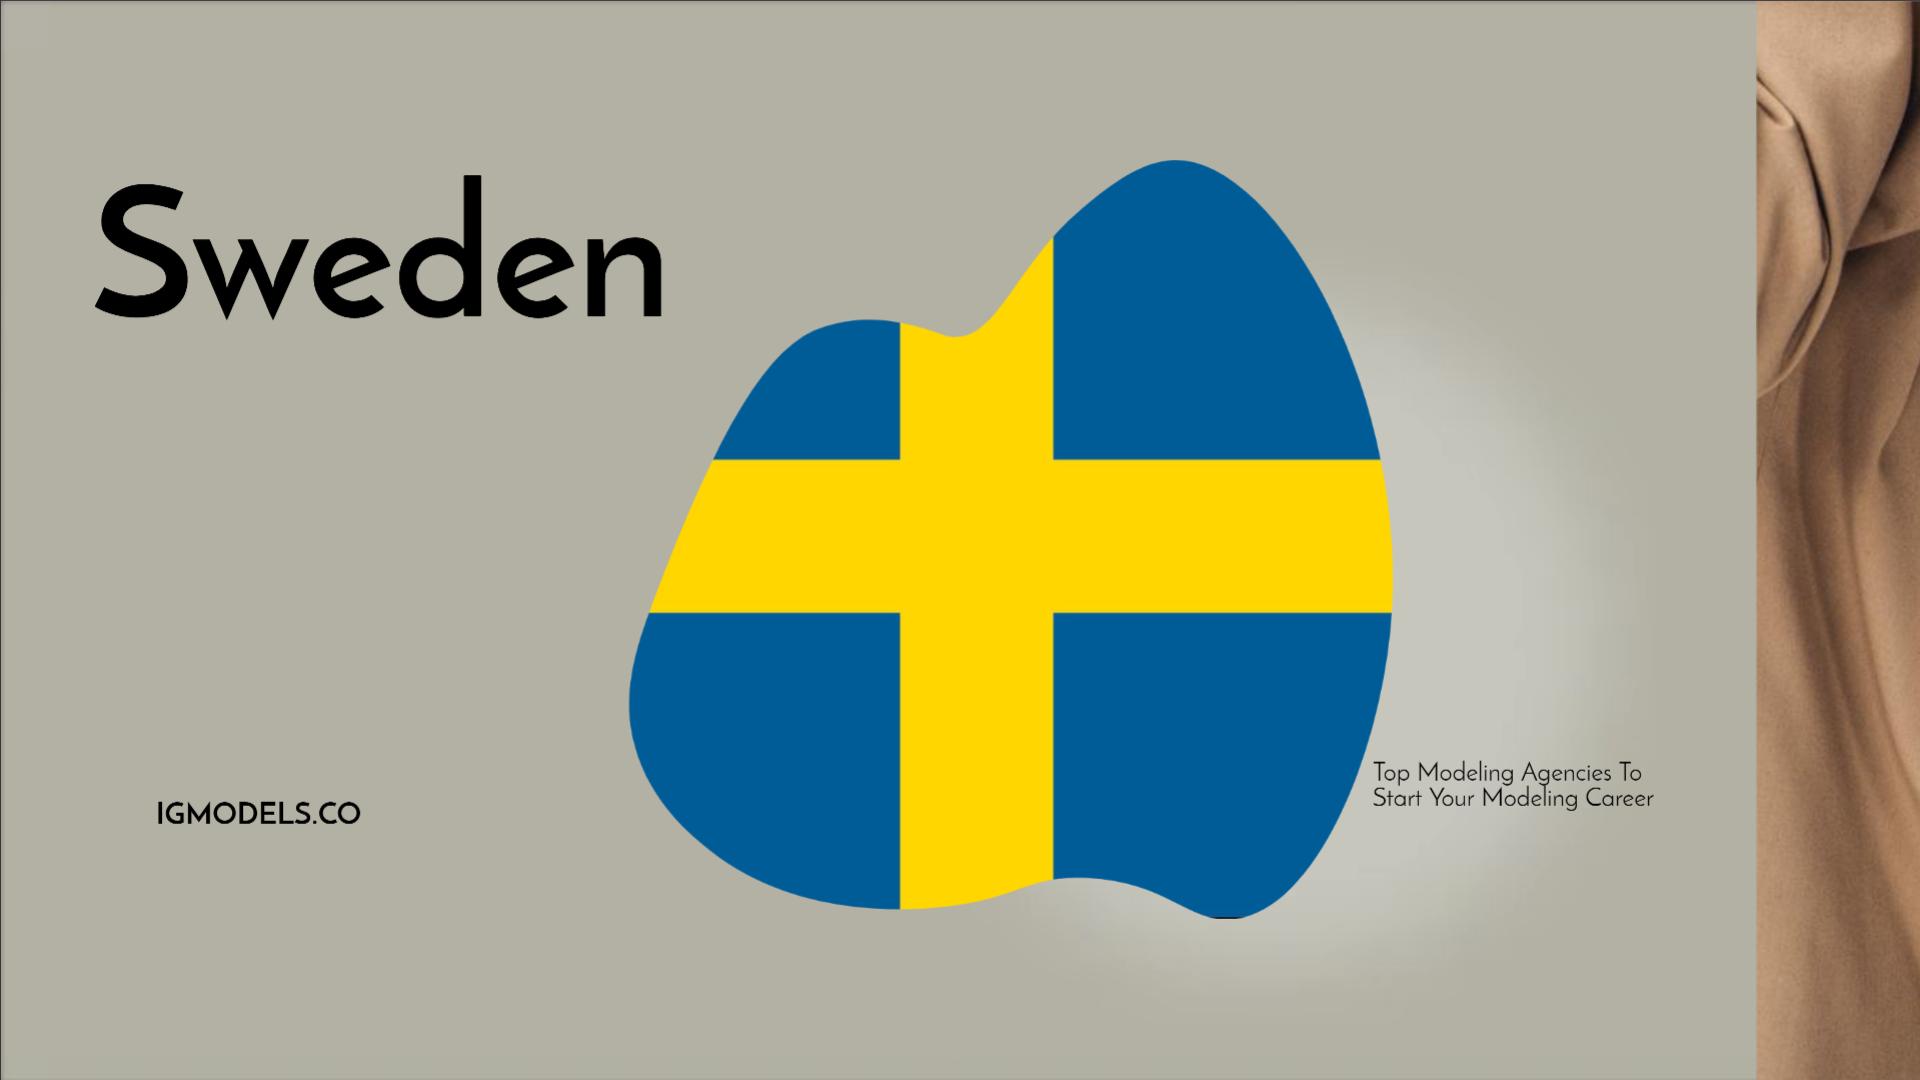 List : Top 35 Modeling Agencies In Sweden To Start Your Modeling Career In 2021